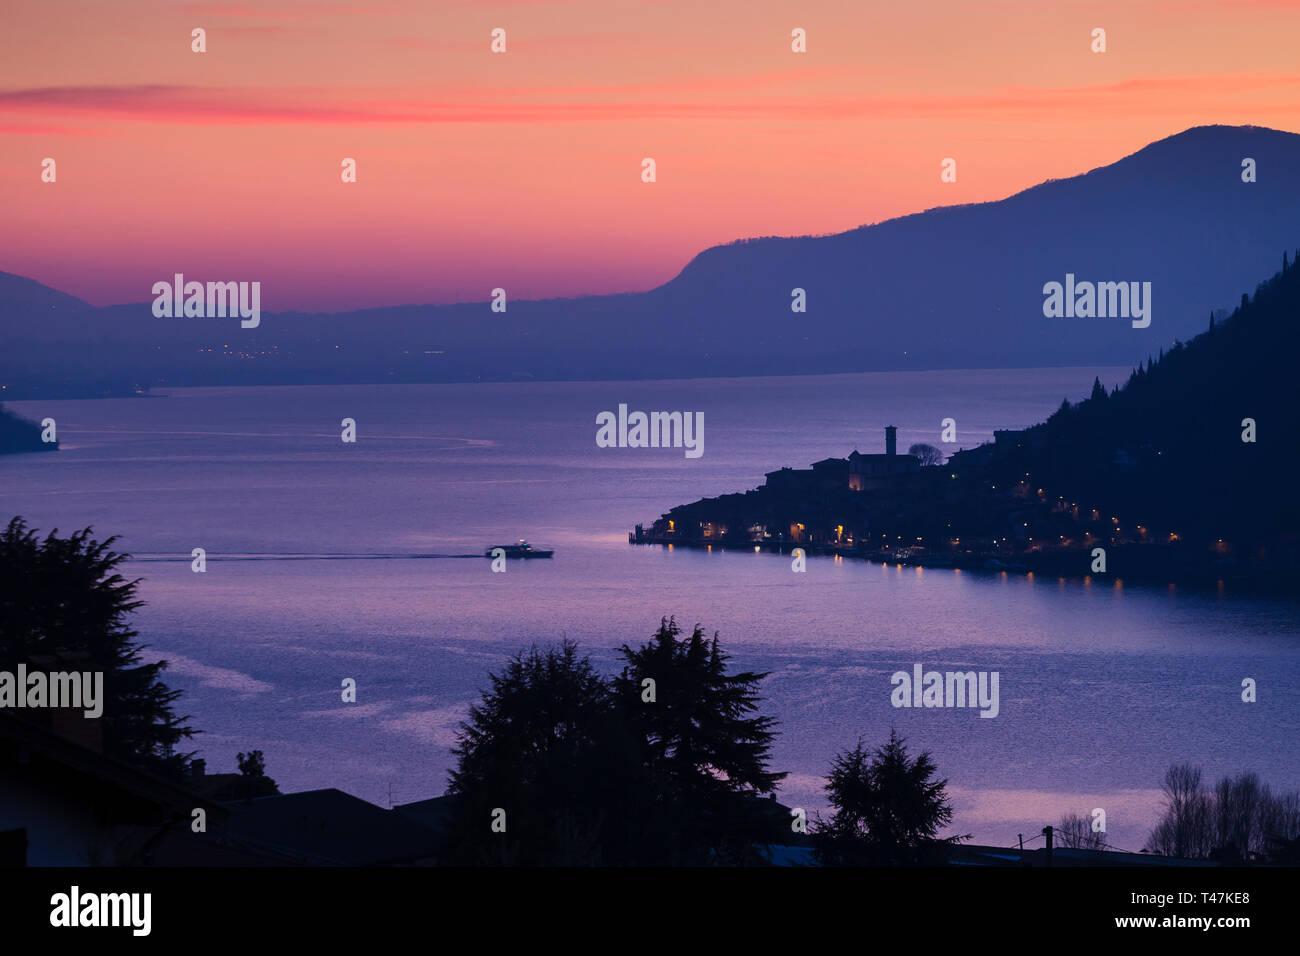 Lake Iseo with Peschiera Maraglio at dusk, Lombardy, Italy Stock Photo